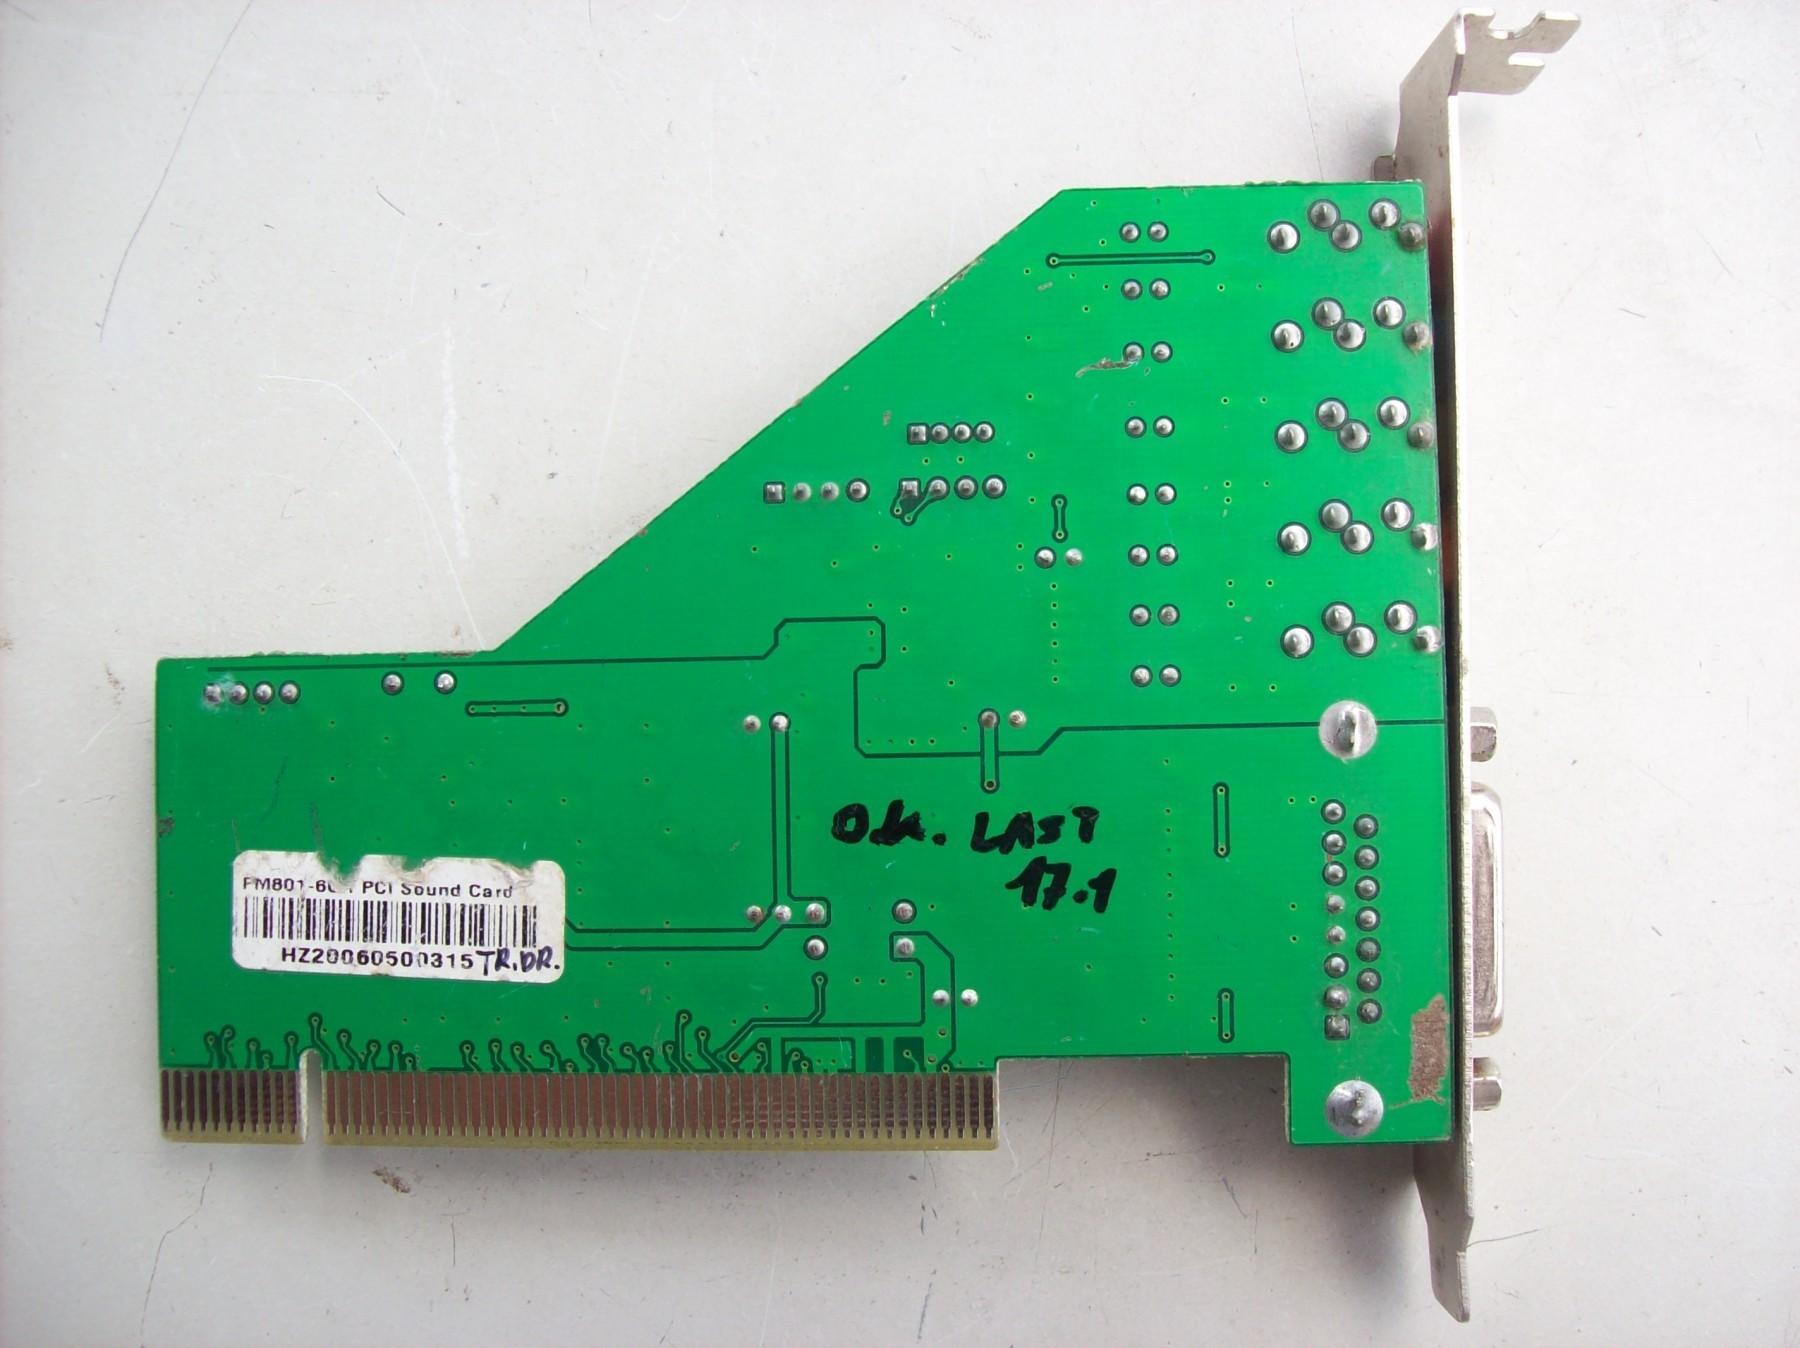 NEW DRIVER: FORTEMEDIA FM801-AU 4-CHANNEL PCI SOUND CARD